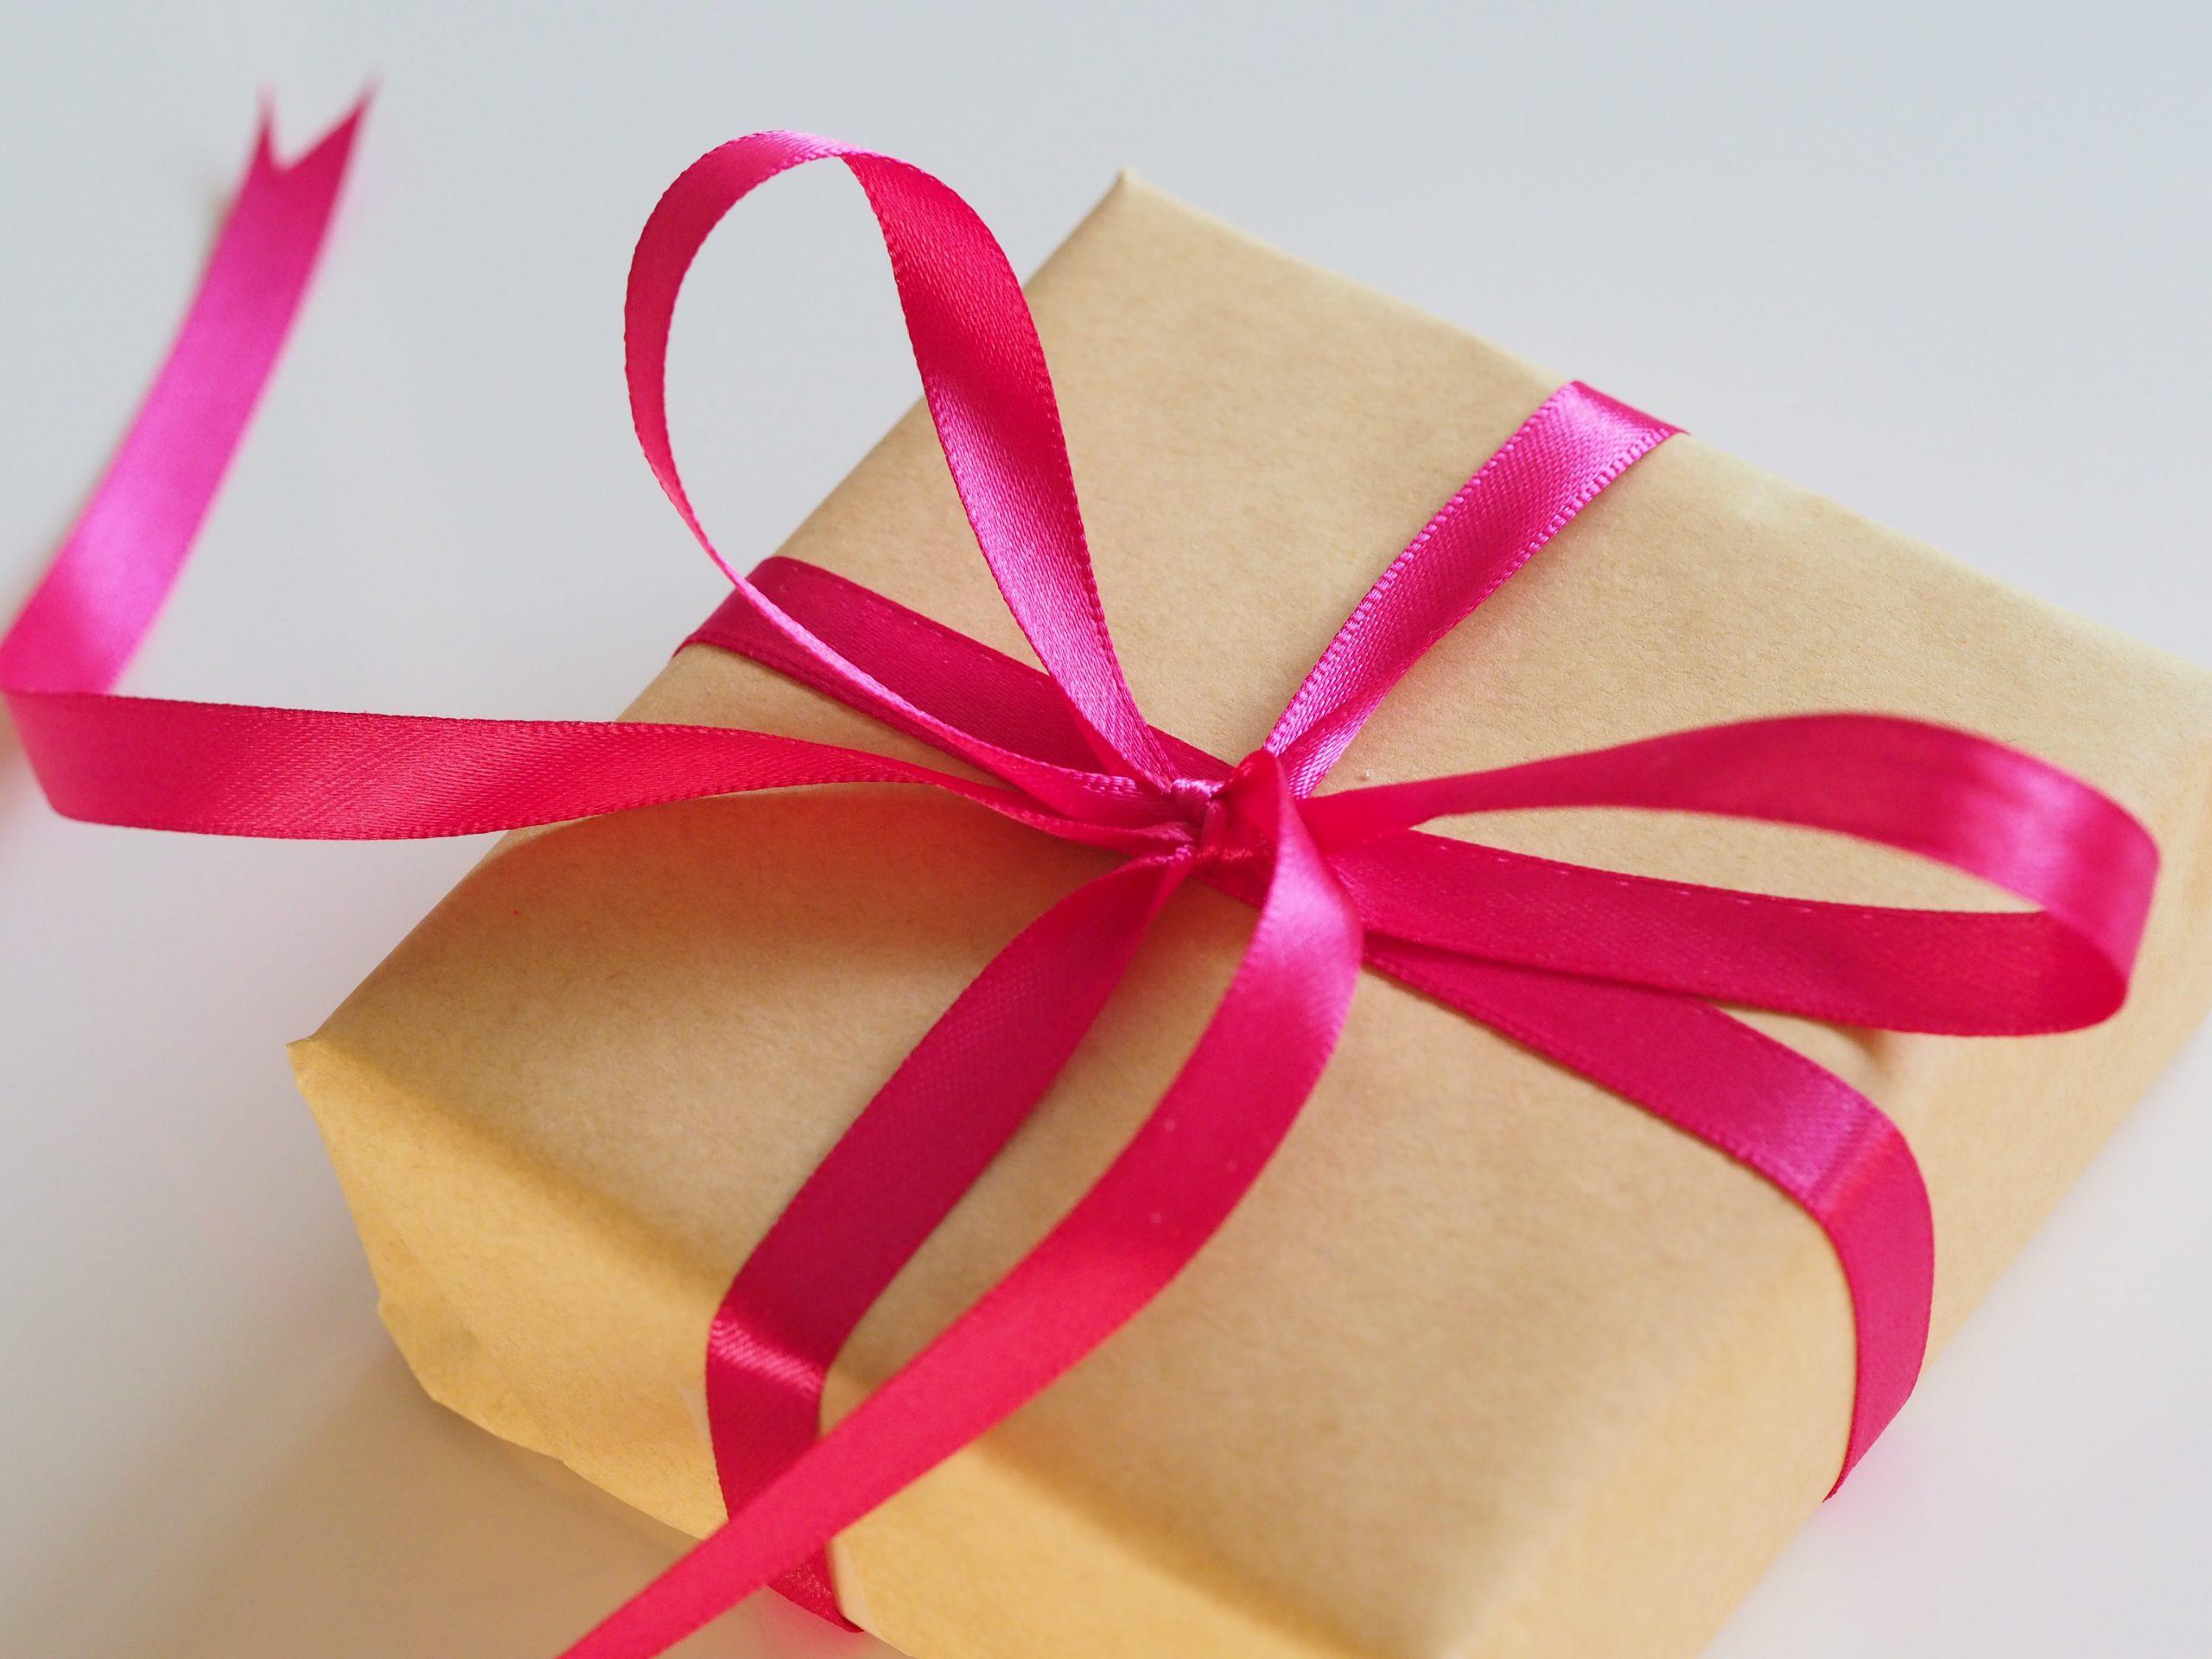 Quel cadeau tendance offrir à un bébé ?